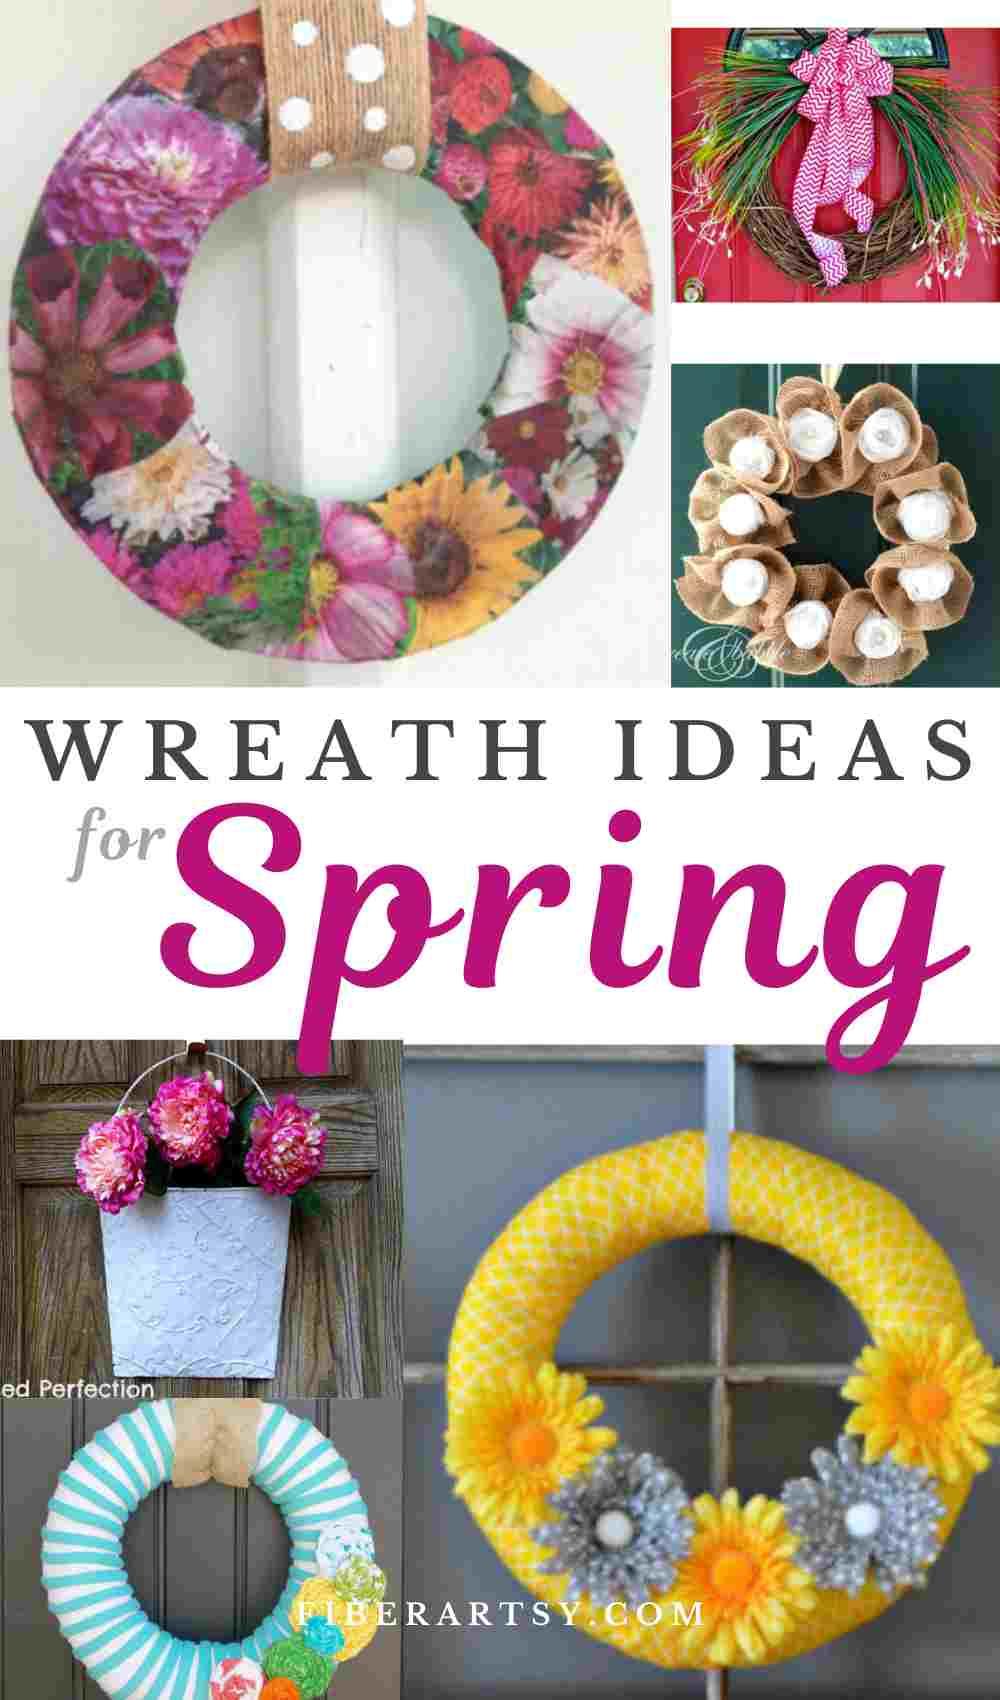 DIY Wreath ideas for Spring